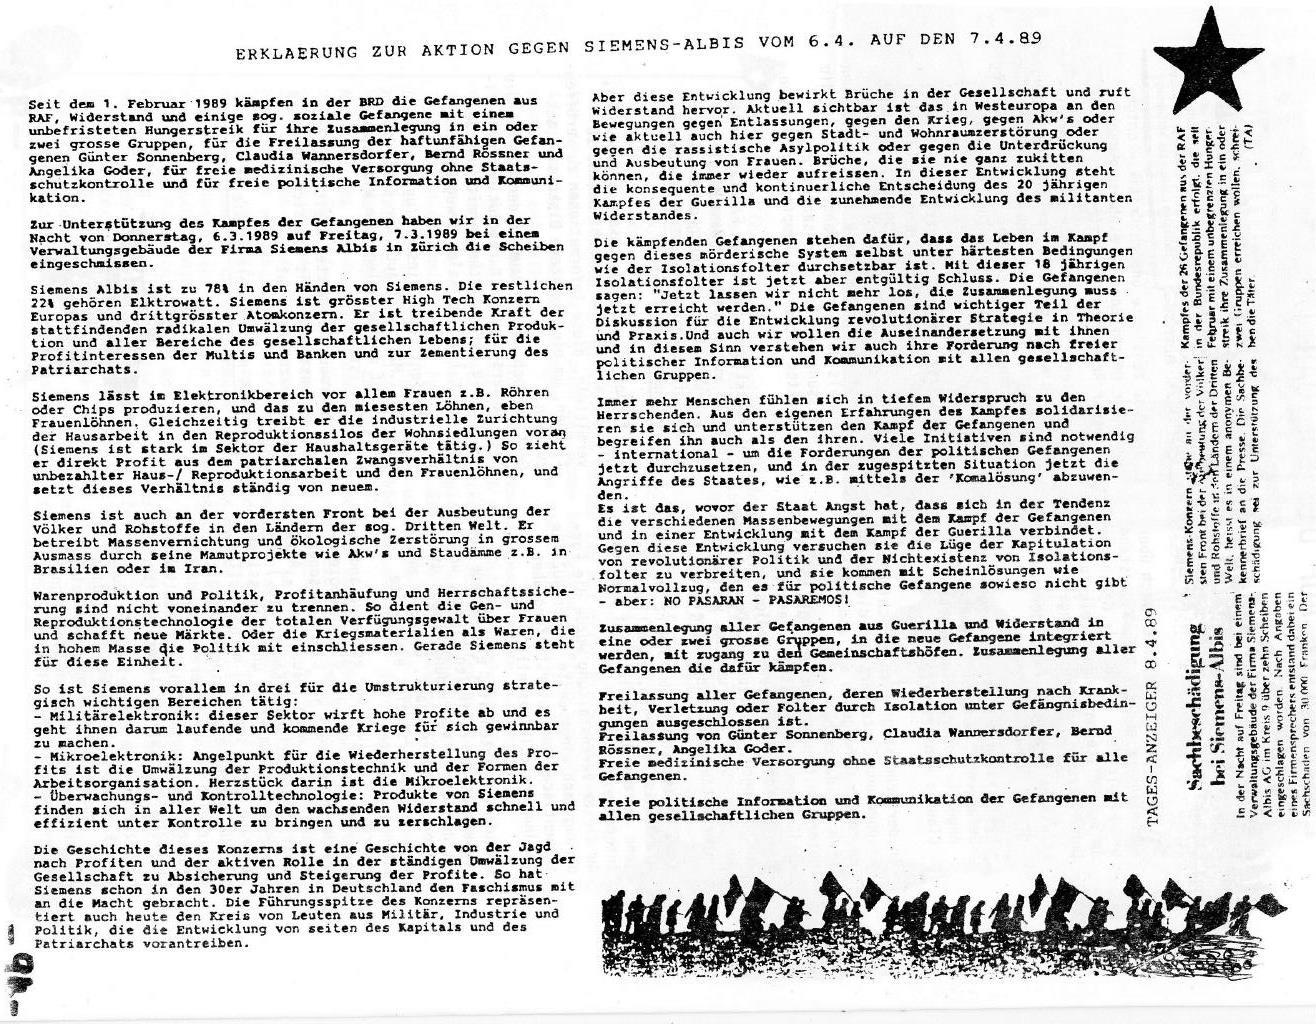 Belgien_Doku_Besetzung_EG_Kommission_1989_096